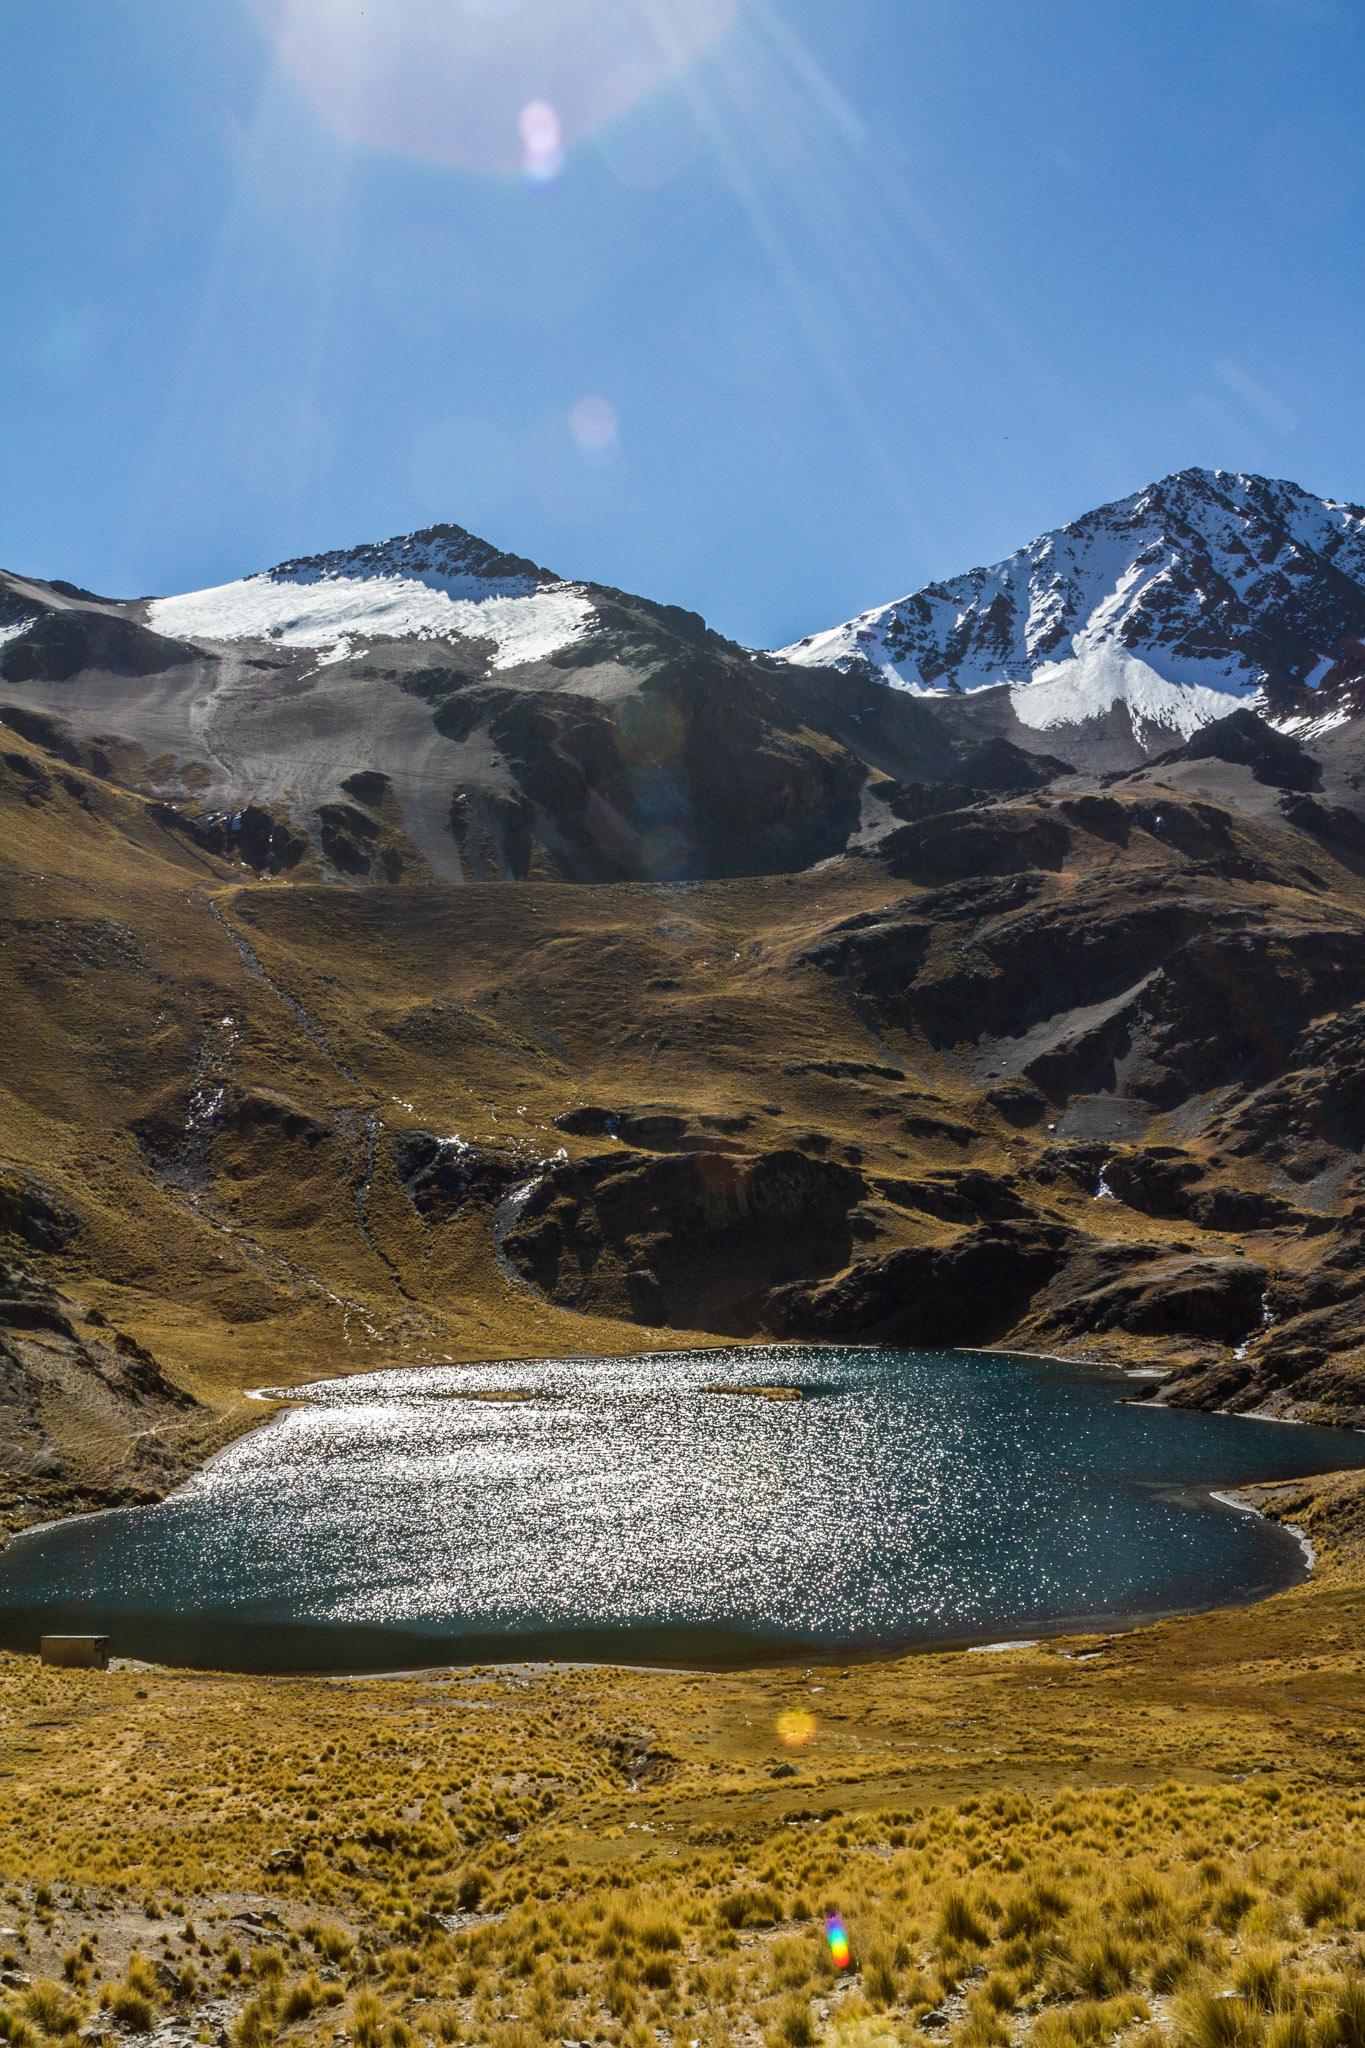 Ali-Barqawi-Studios-Explore-Series-Travel-Adventure-Documentary-C4CGAZA-Bolivia-Mount-Tarija-2015-116.jpg